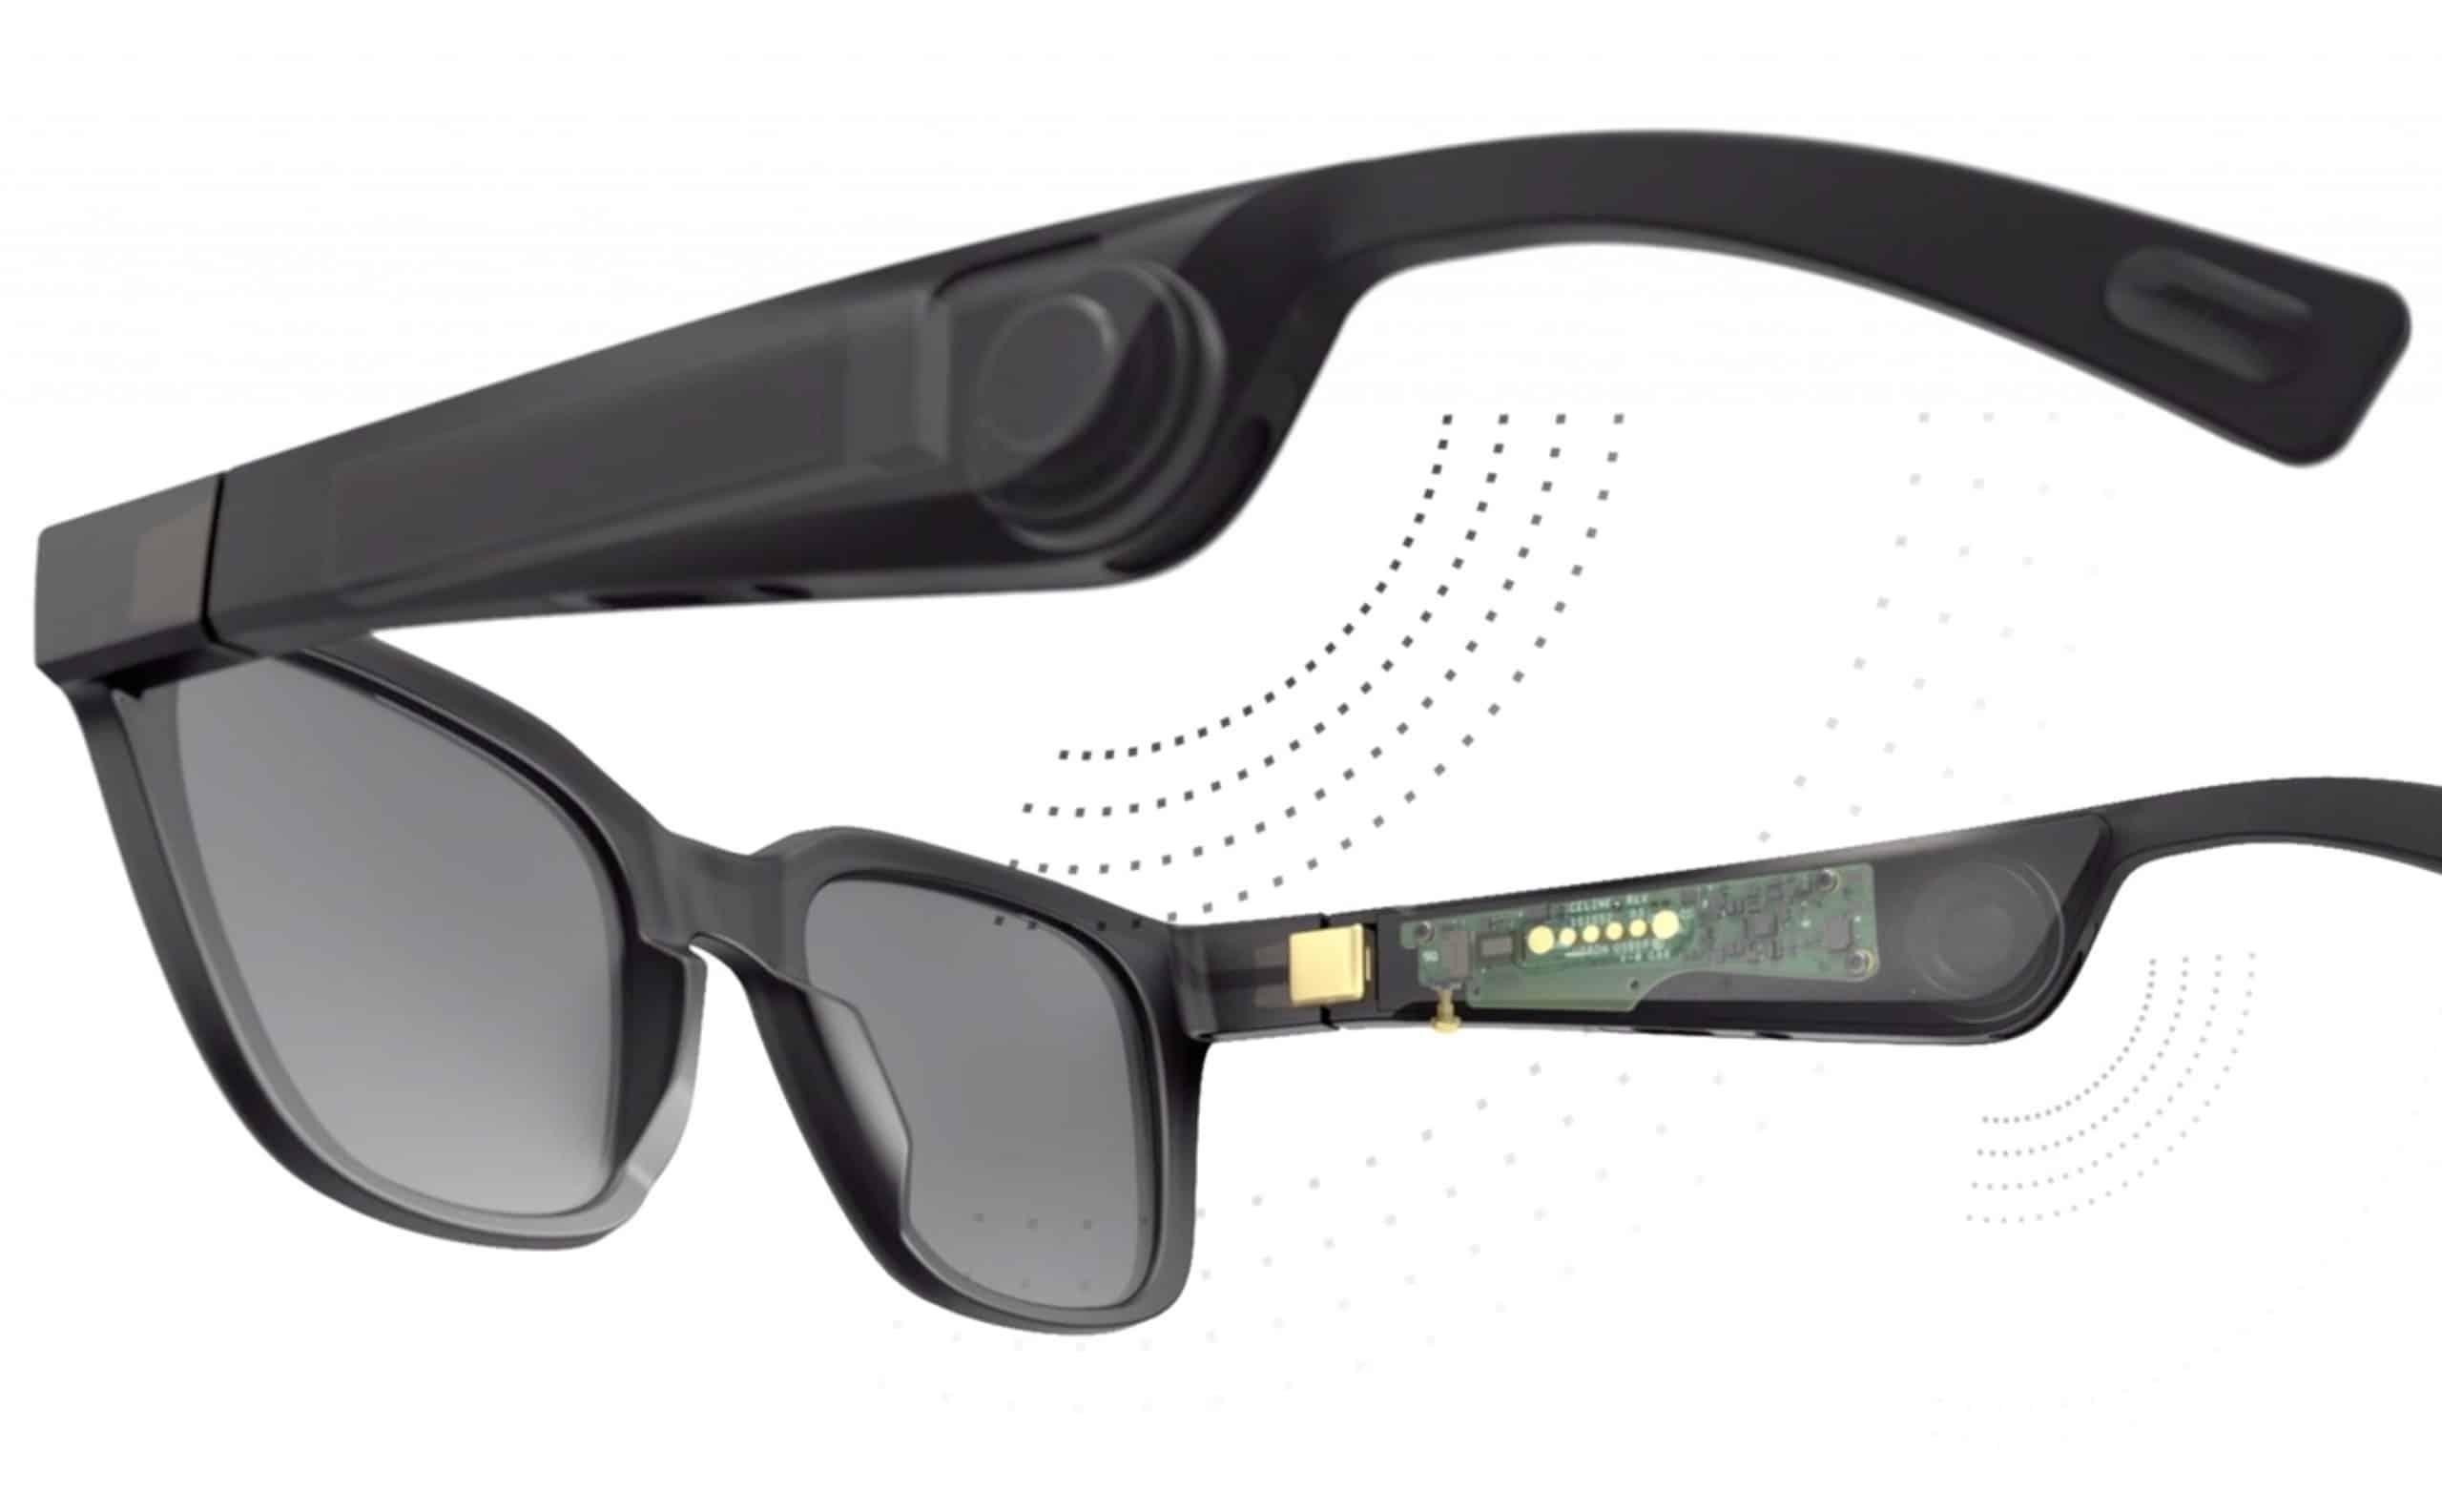 Bose Frames Audio Sunglasses 34